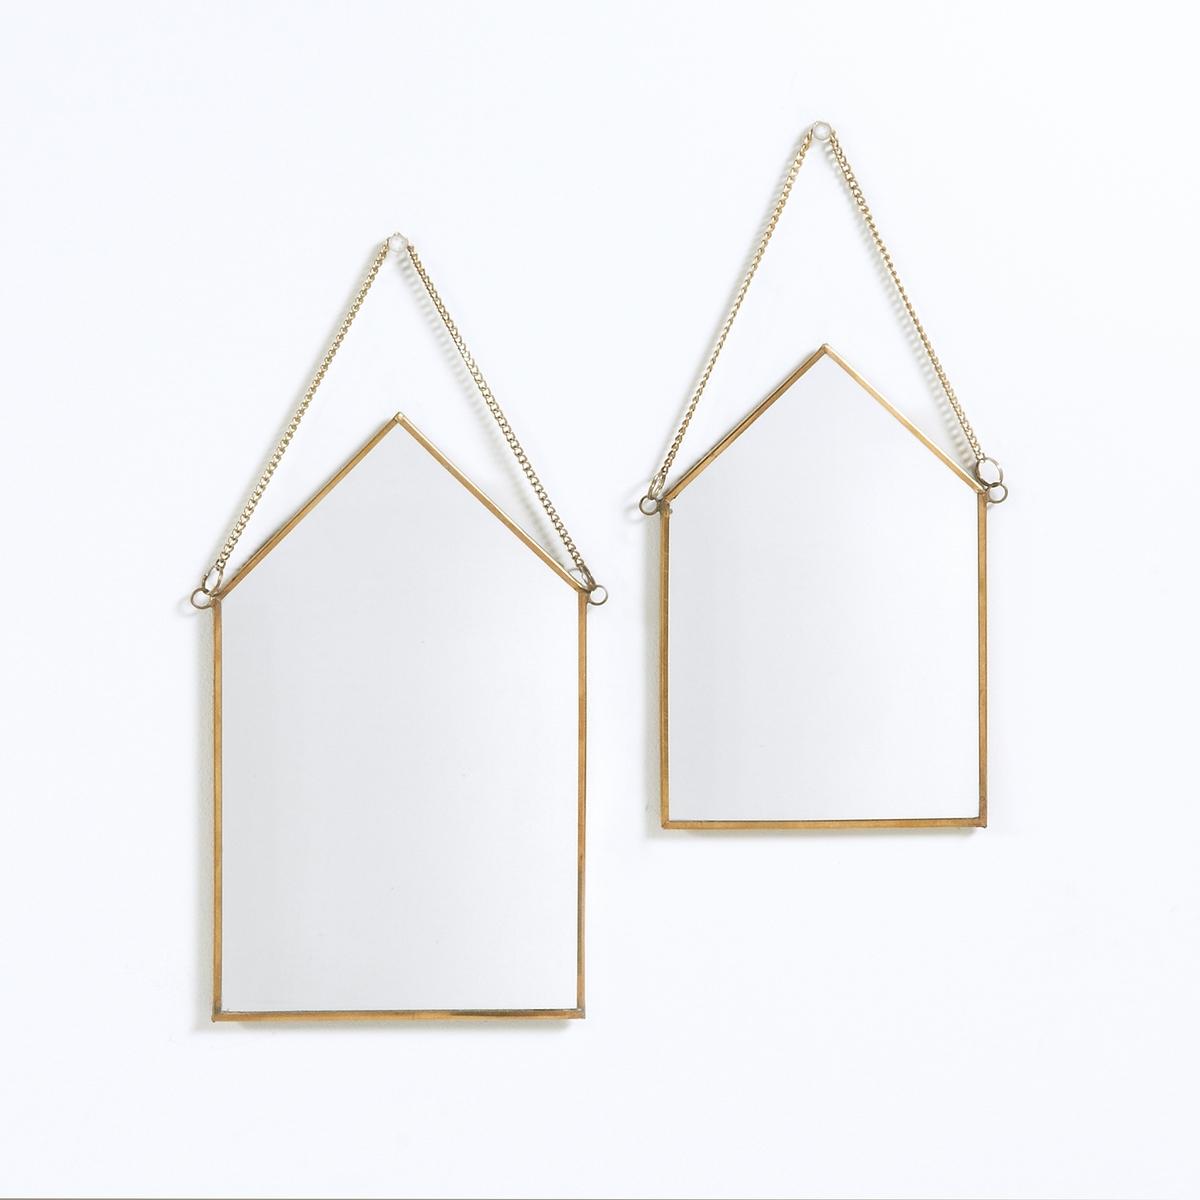 2 зеркала Uyova в форме домика